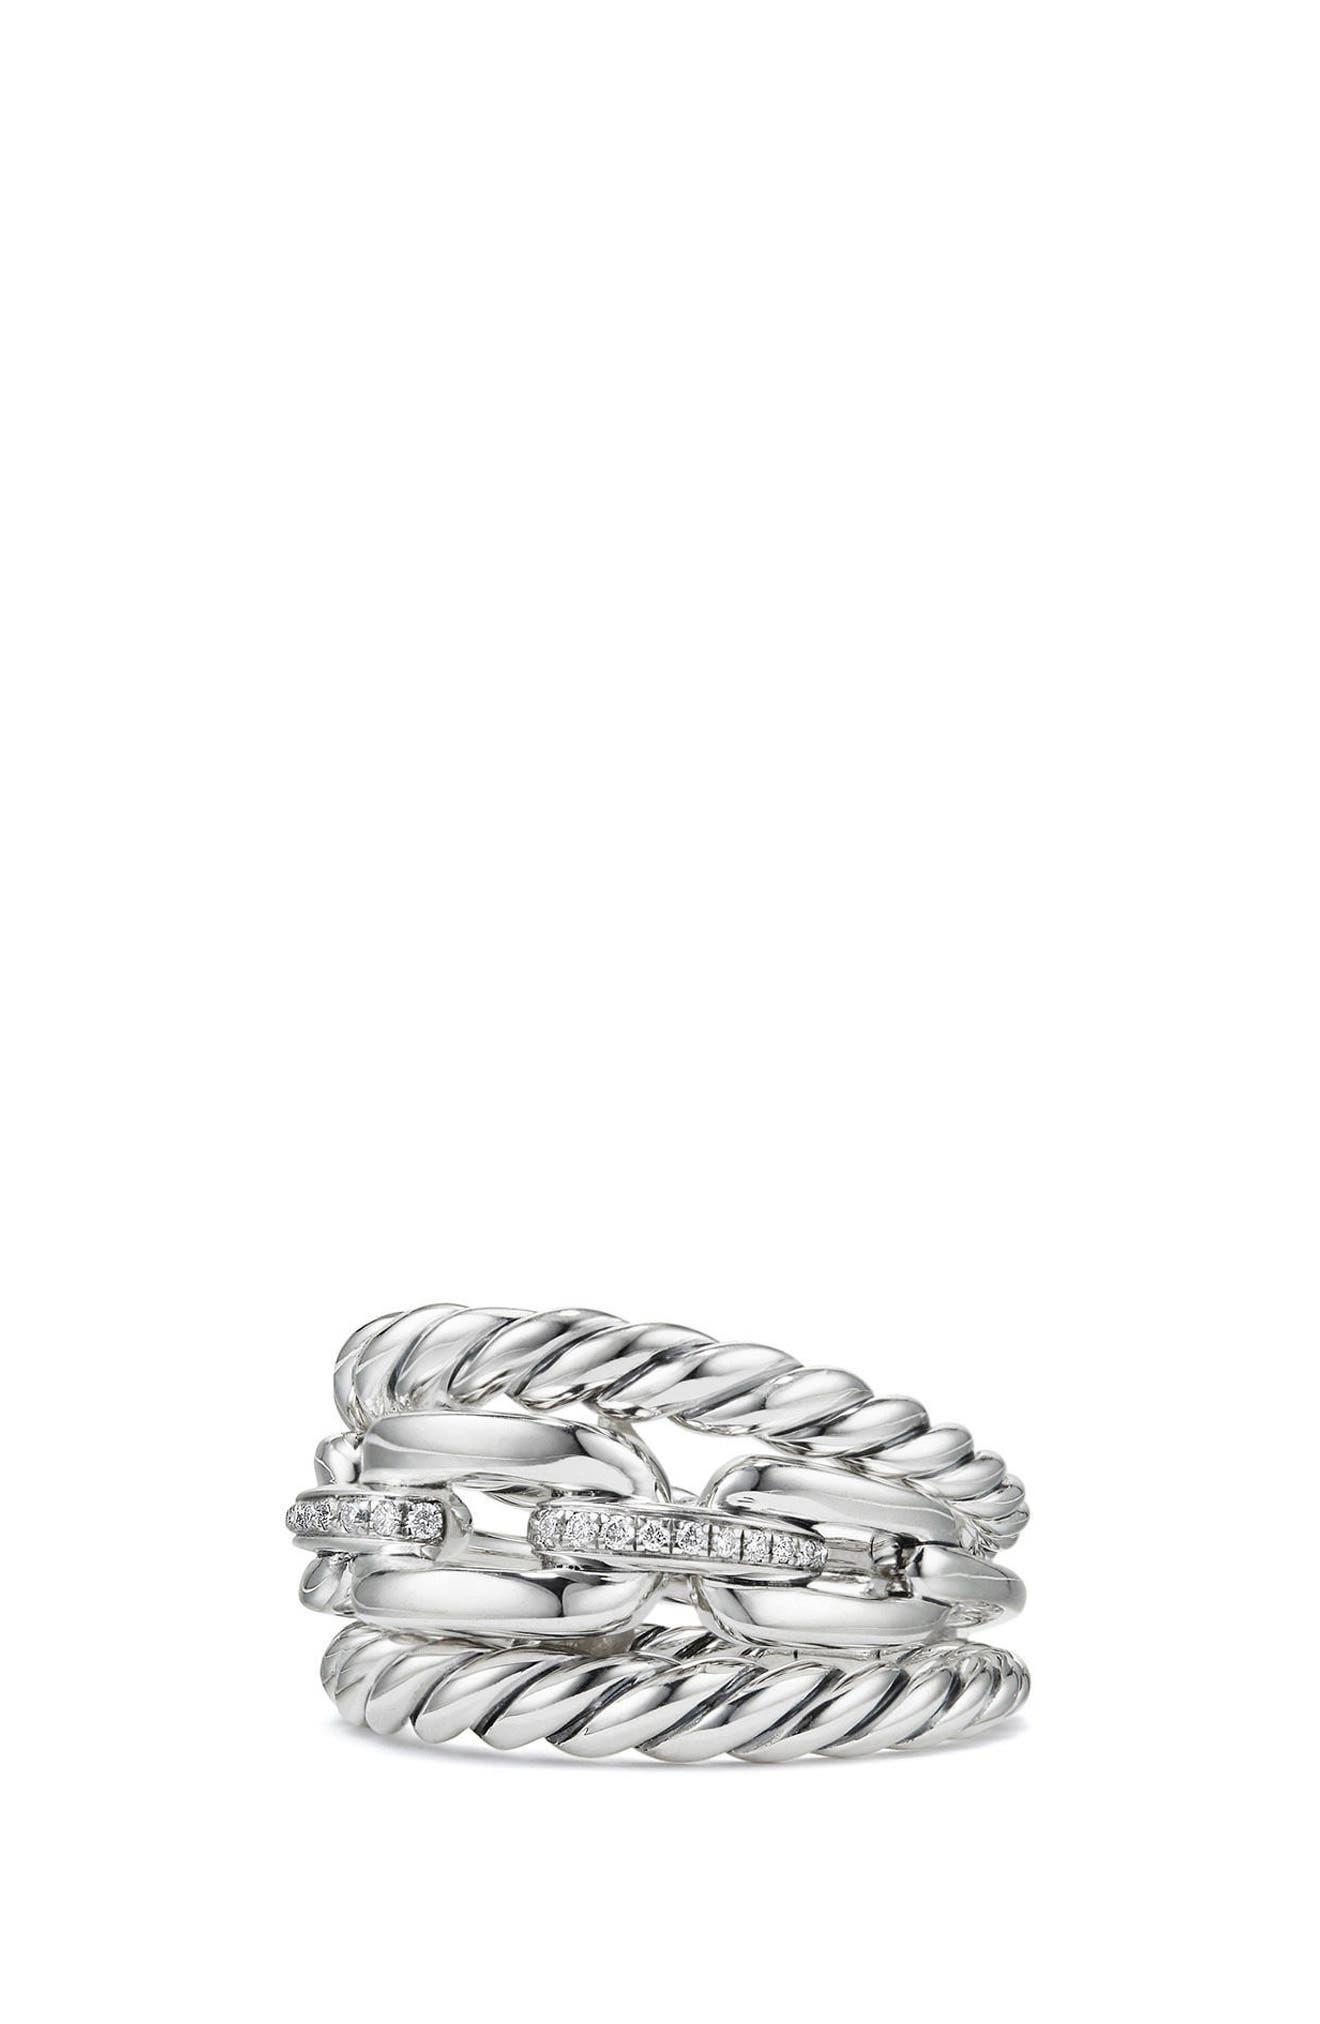 David Yurman Stax Three-Row Ring with Diamonds